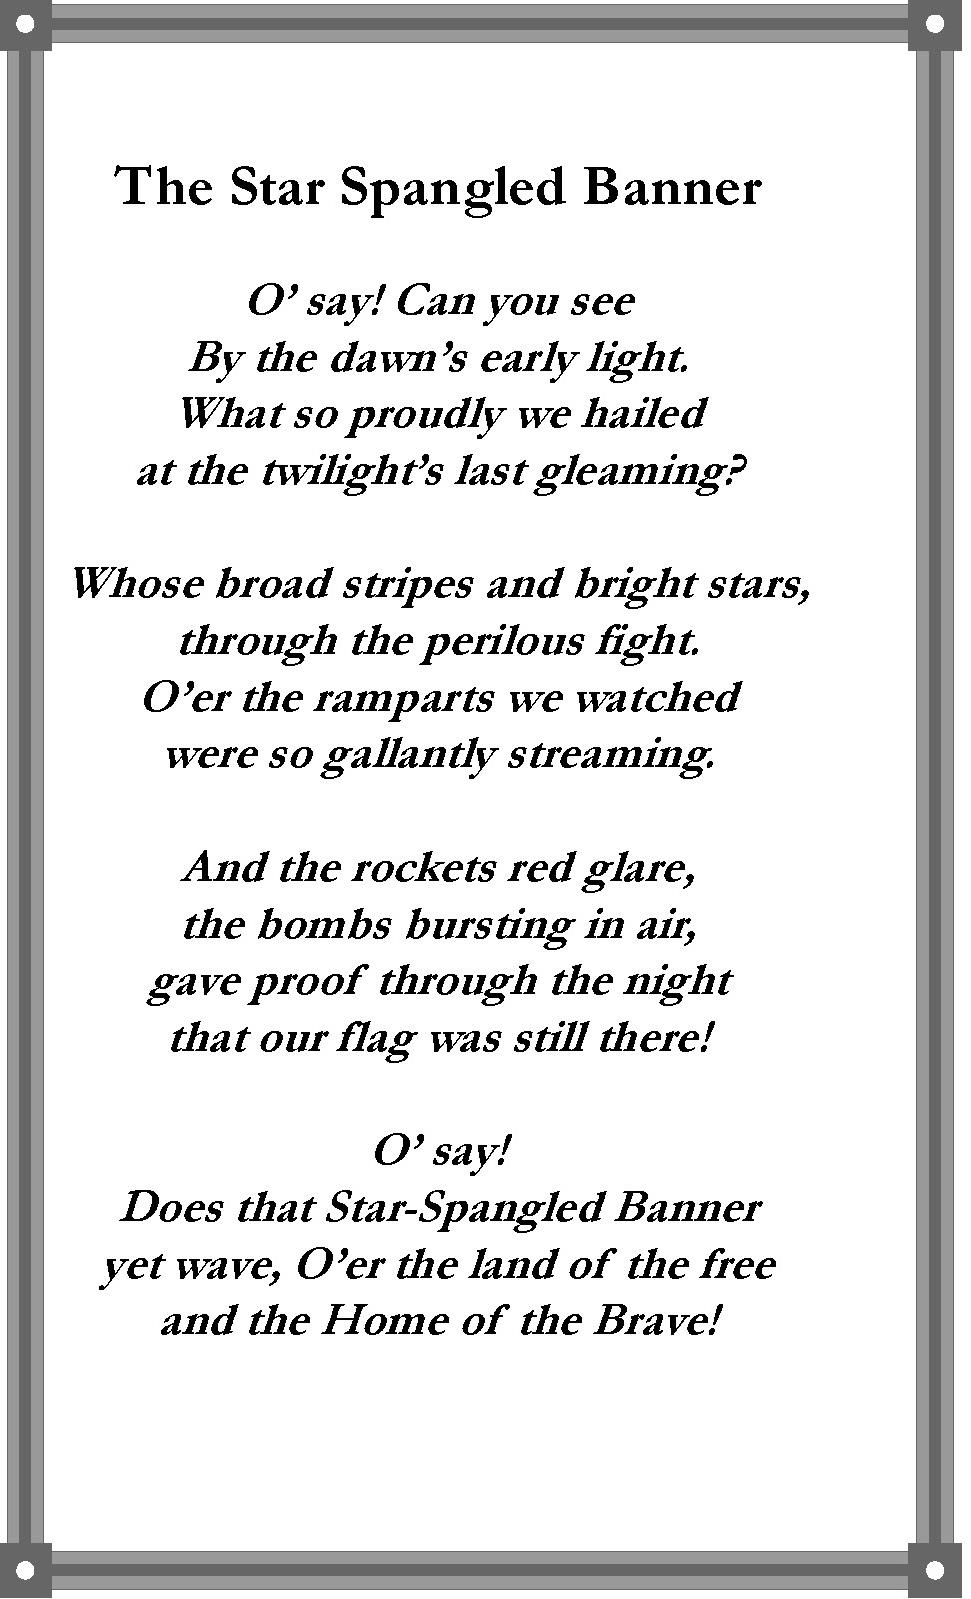 140426 Buchanan_Handout_2014_223rd_Anv_Page_1 (1) back cover Star Spangled Banner.jpg